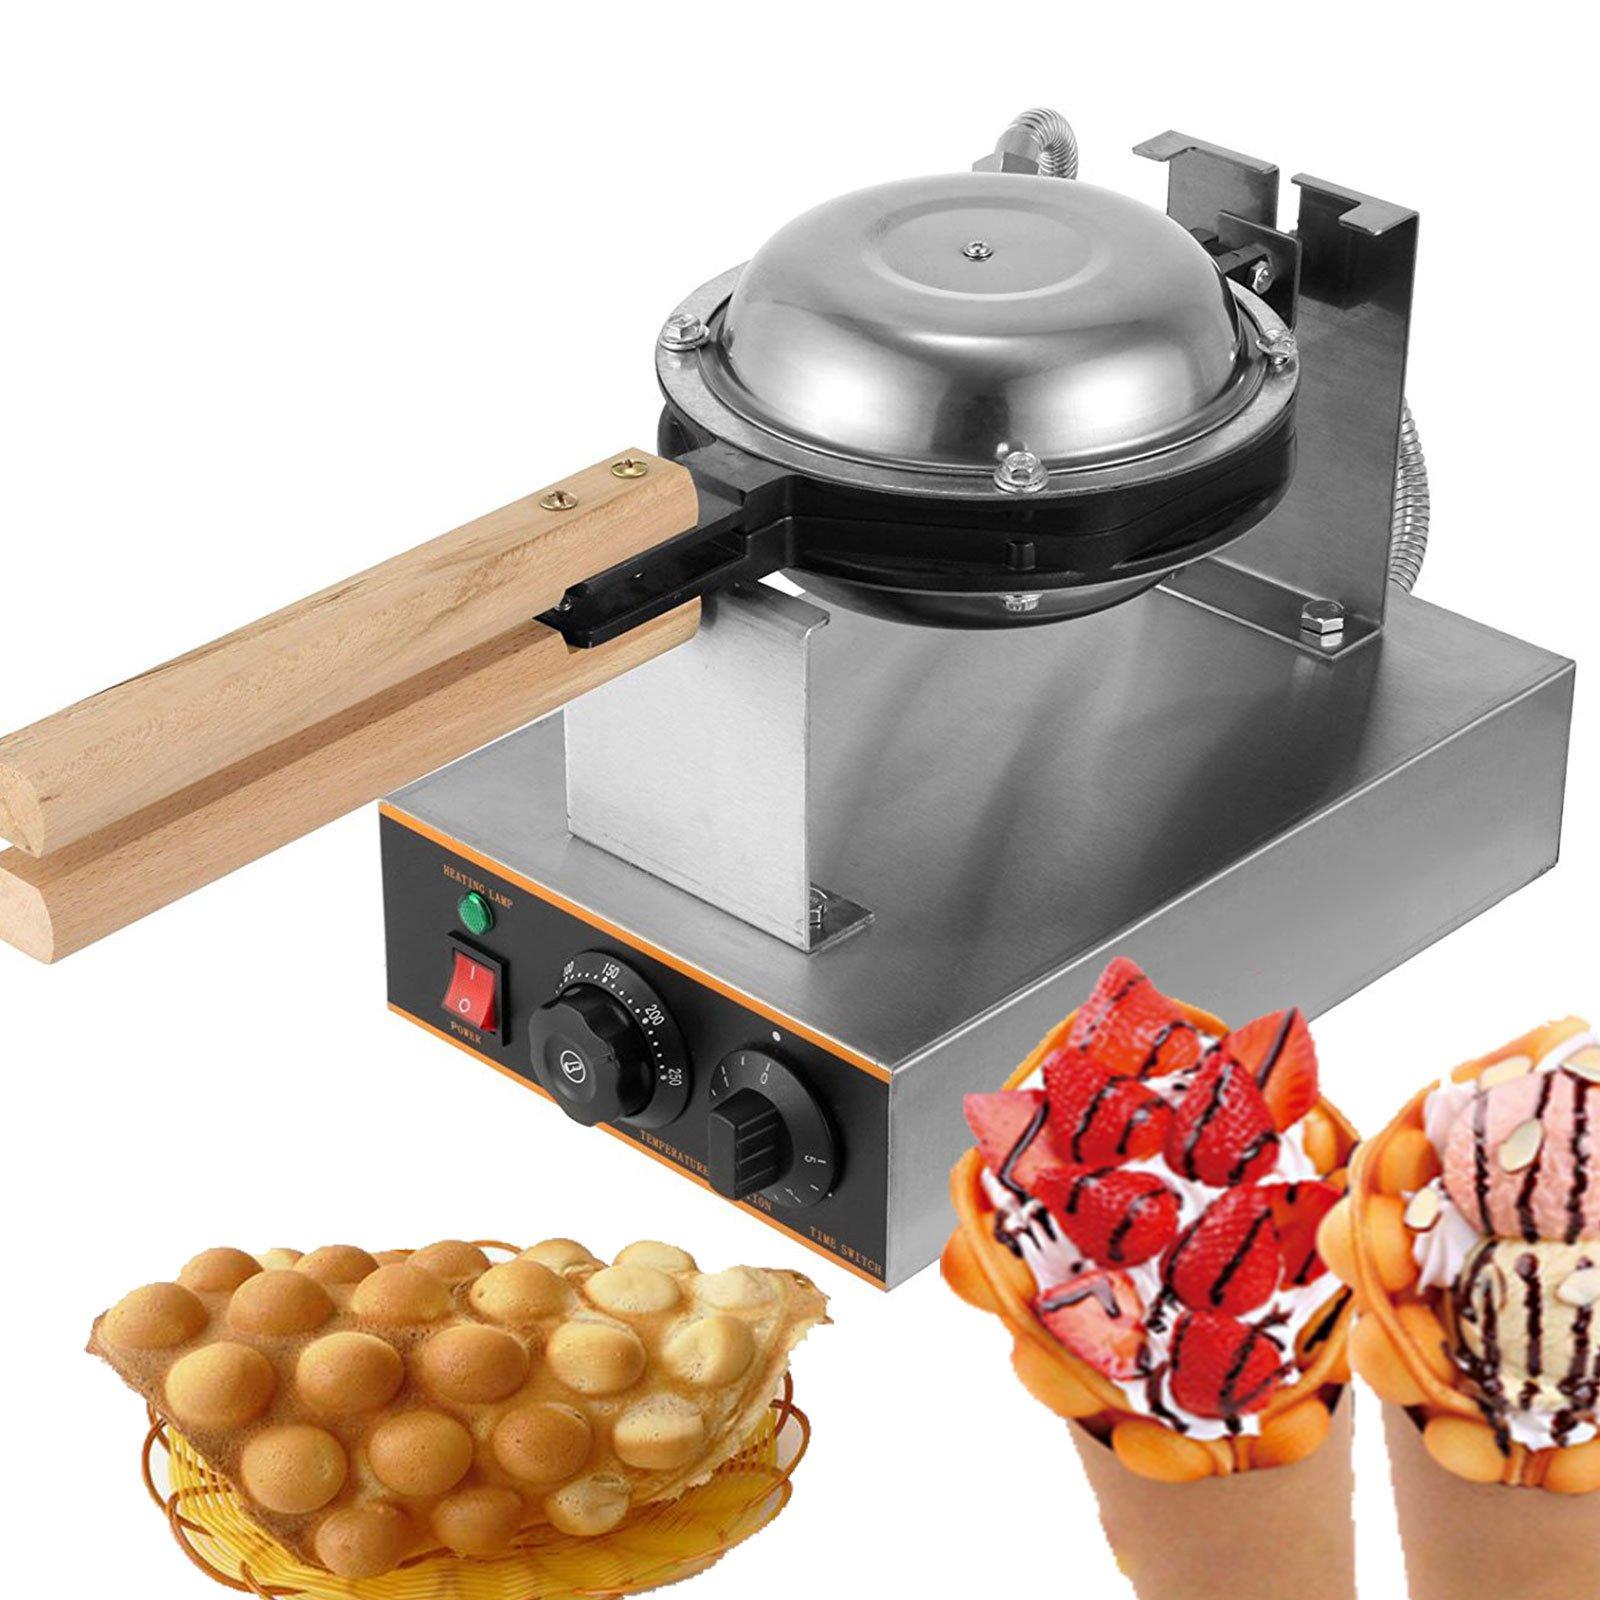 Happybuy Puffle Waffle Maker 1400W Professional Rotated Nonstick 110V Hong Kong Egg Bubble Waffle Maker